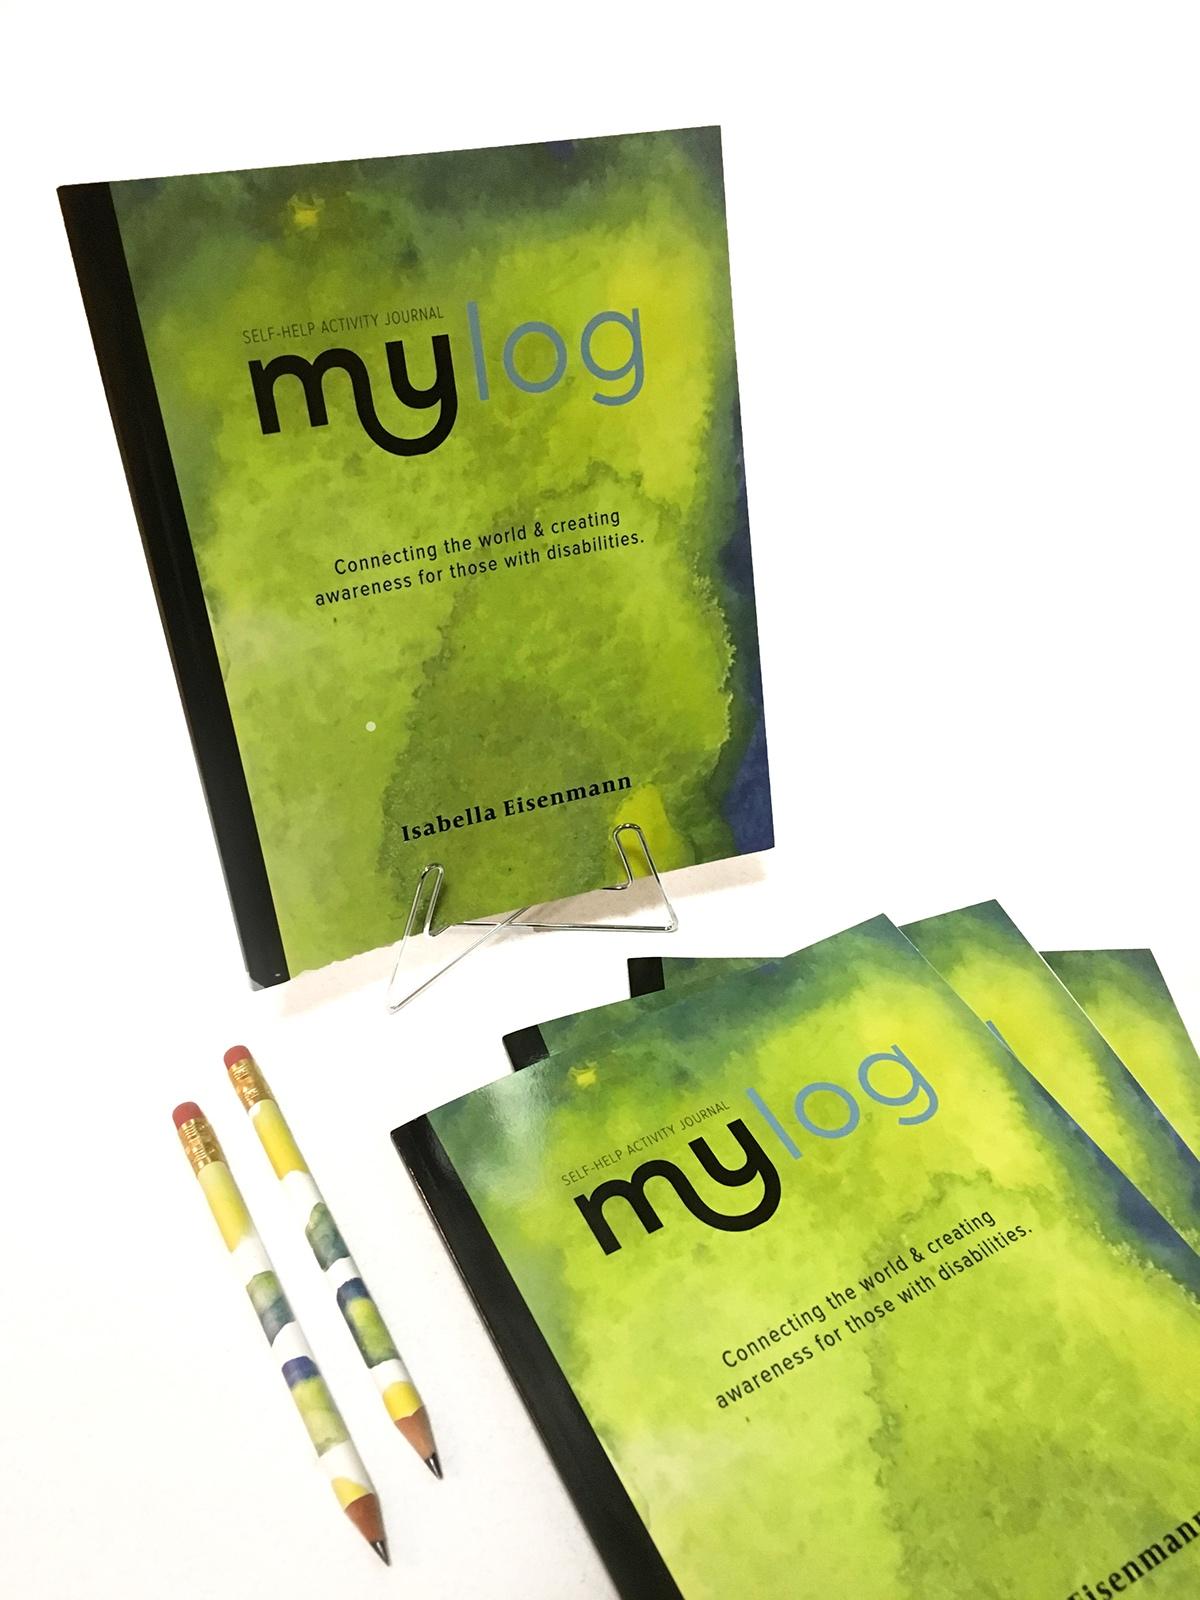 thesis degree project log book testimony self help psychology disability disabilities guidance Testimonies activities journal help understanding